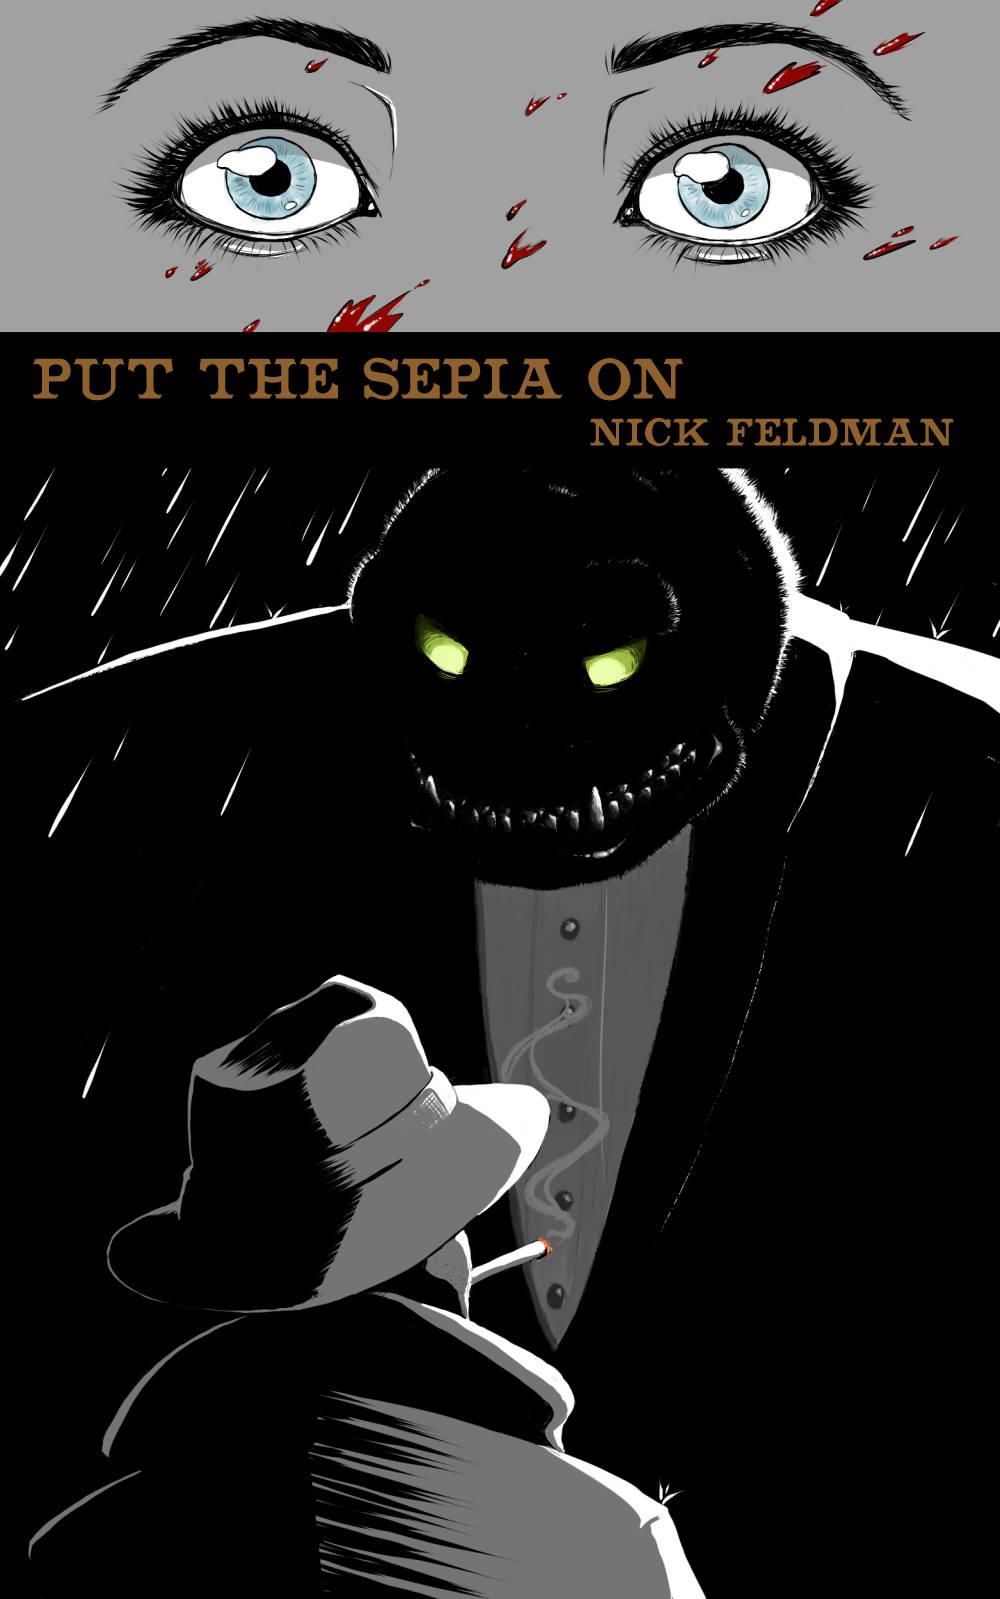 Put The Sepia On - By Nick Feldman